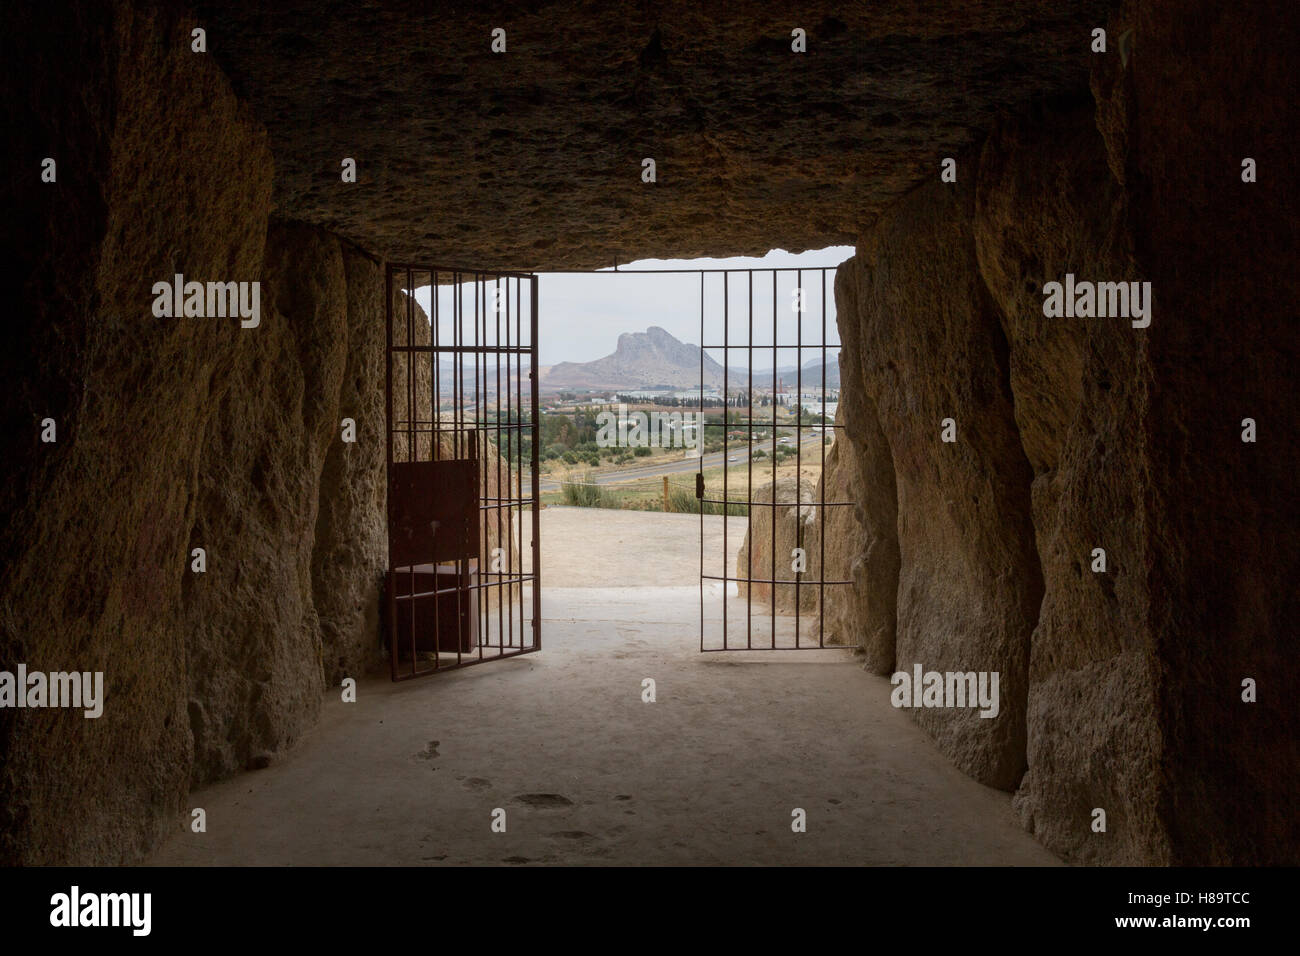 Antequera dolmen, Málaga, Spain - Stock Image